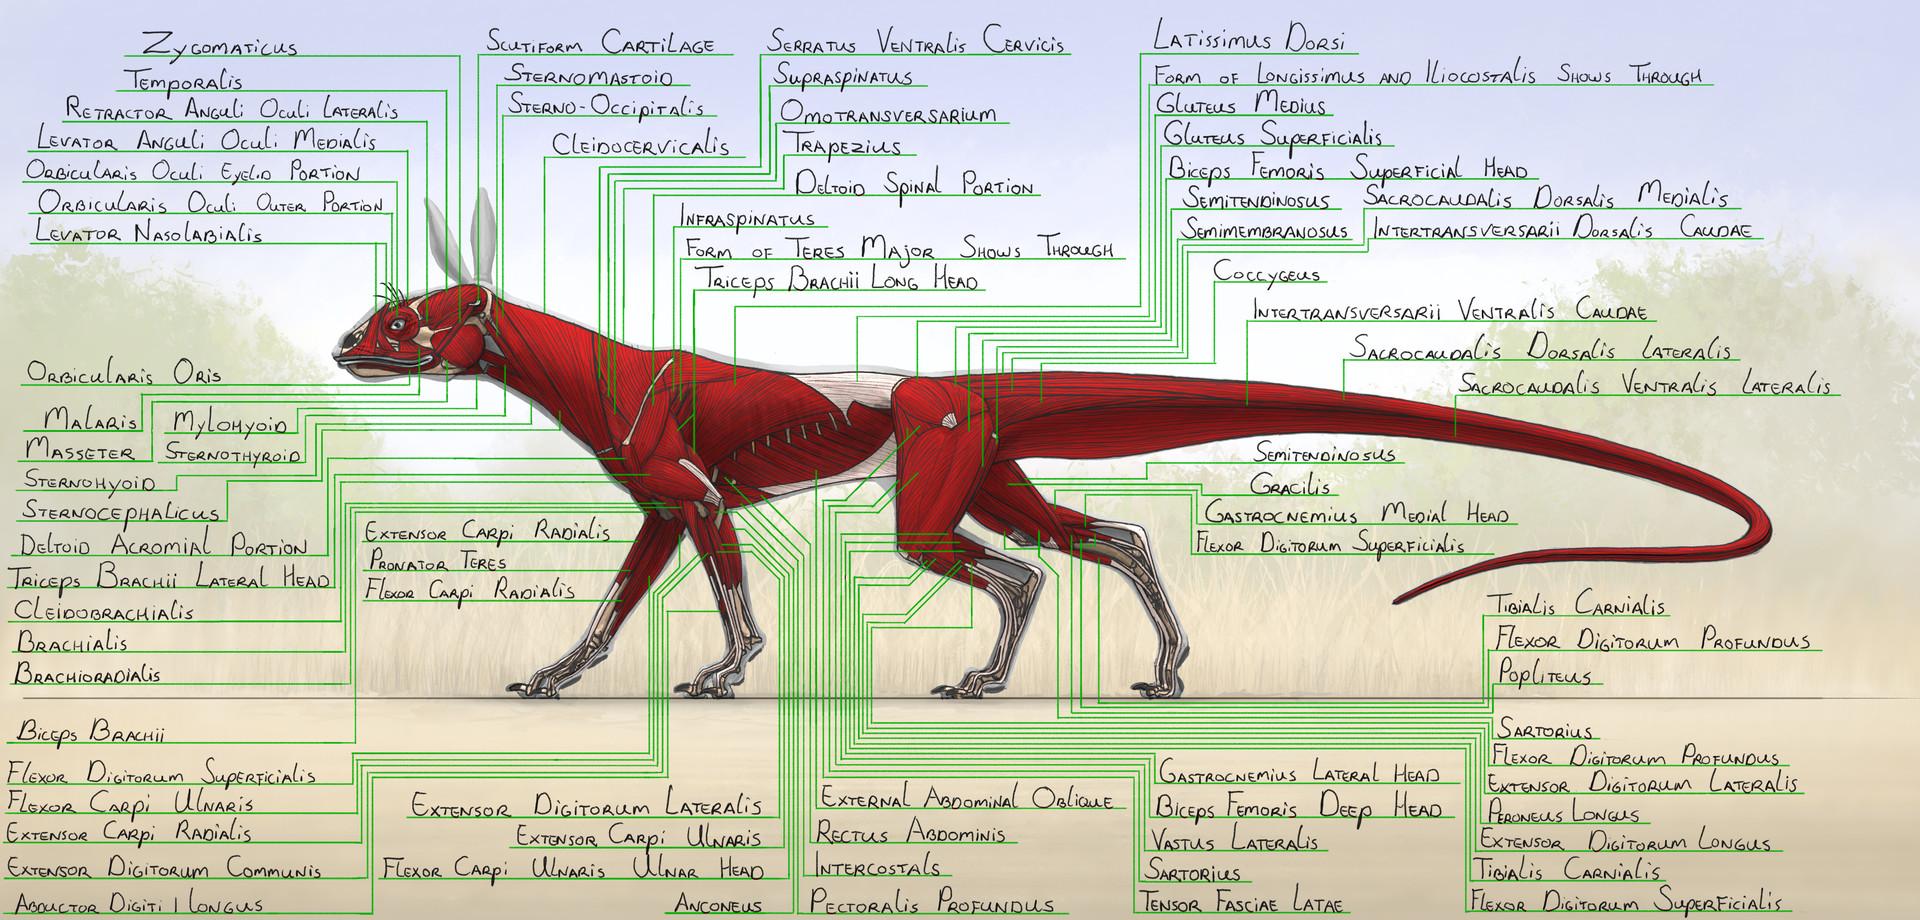 jordi van hees - Fantastical Tetrapod Anatomical Study